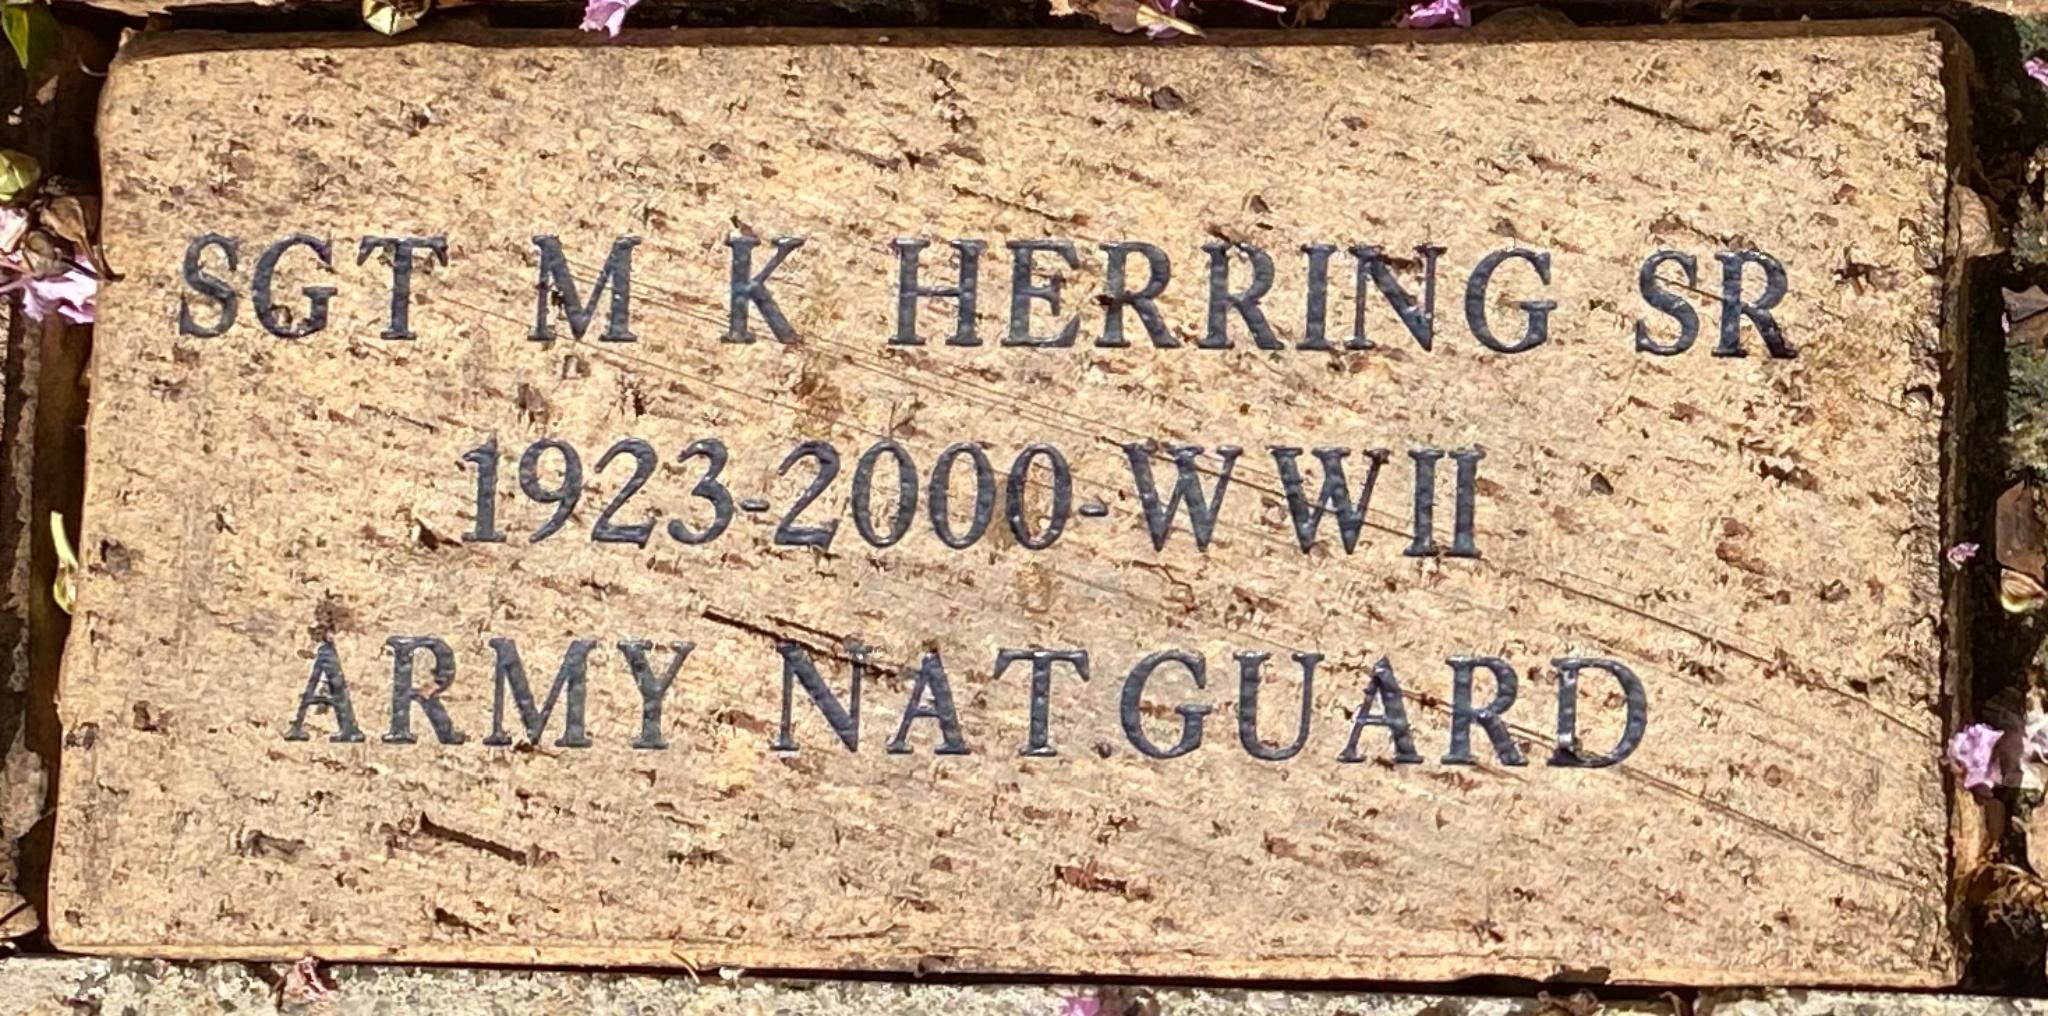 SGT M K HERRING SR 1923-2000 WWII ARMY NAT. GUARD